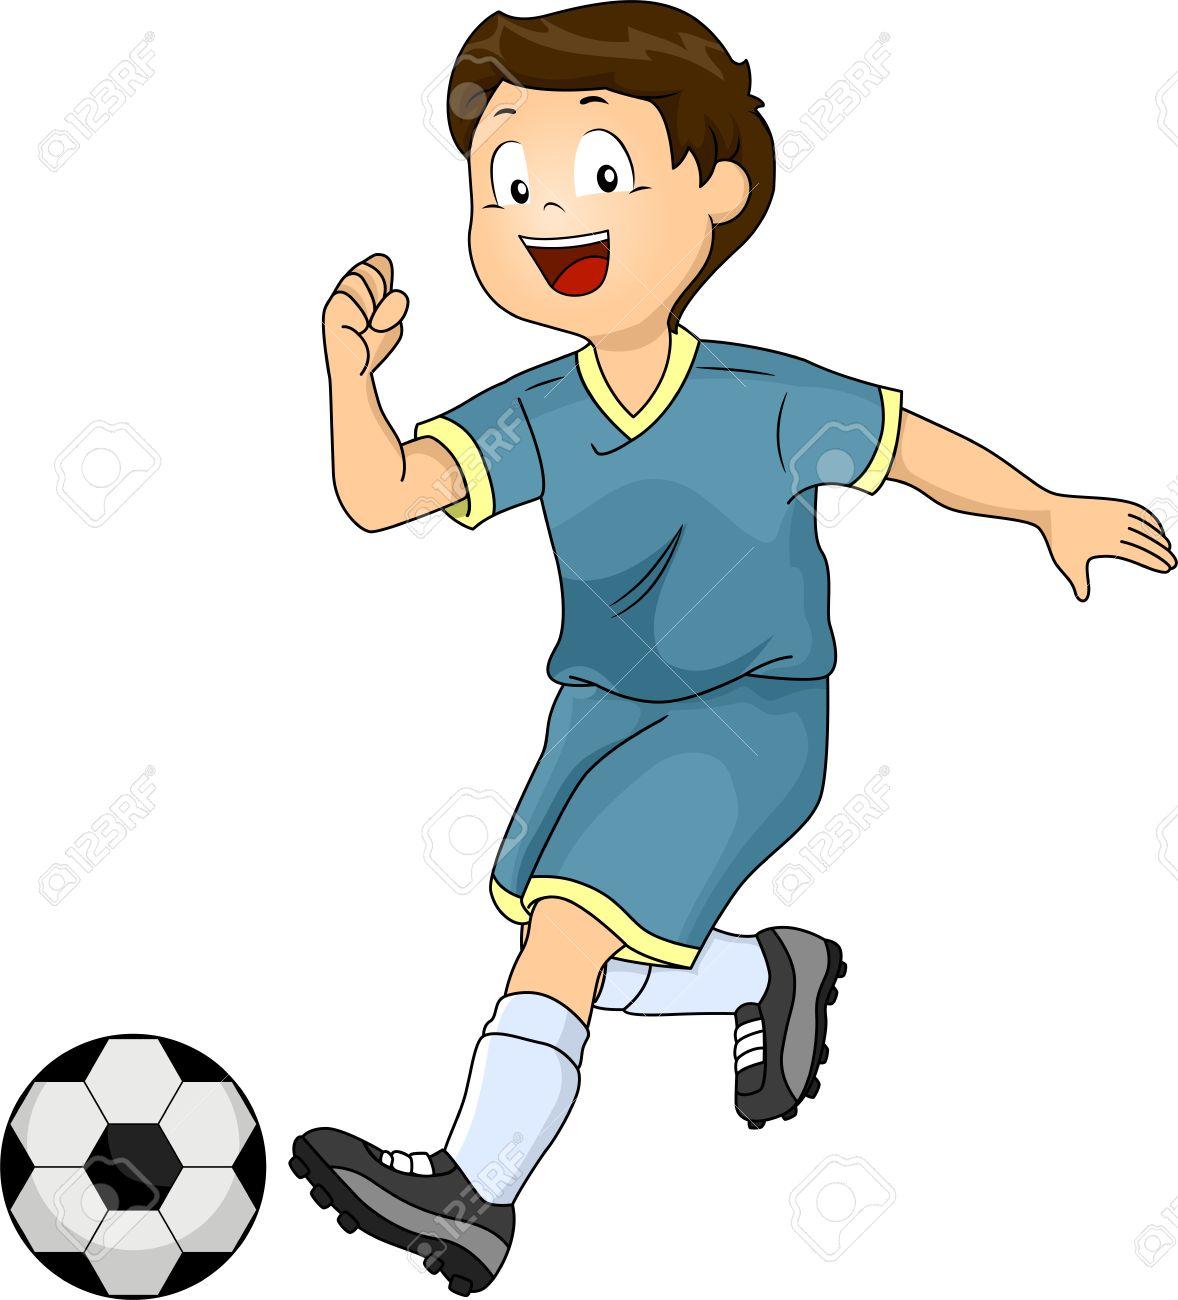 Boy Kicking Ball Clipart.